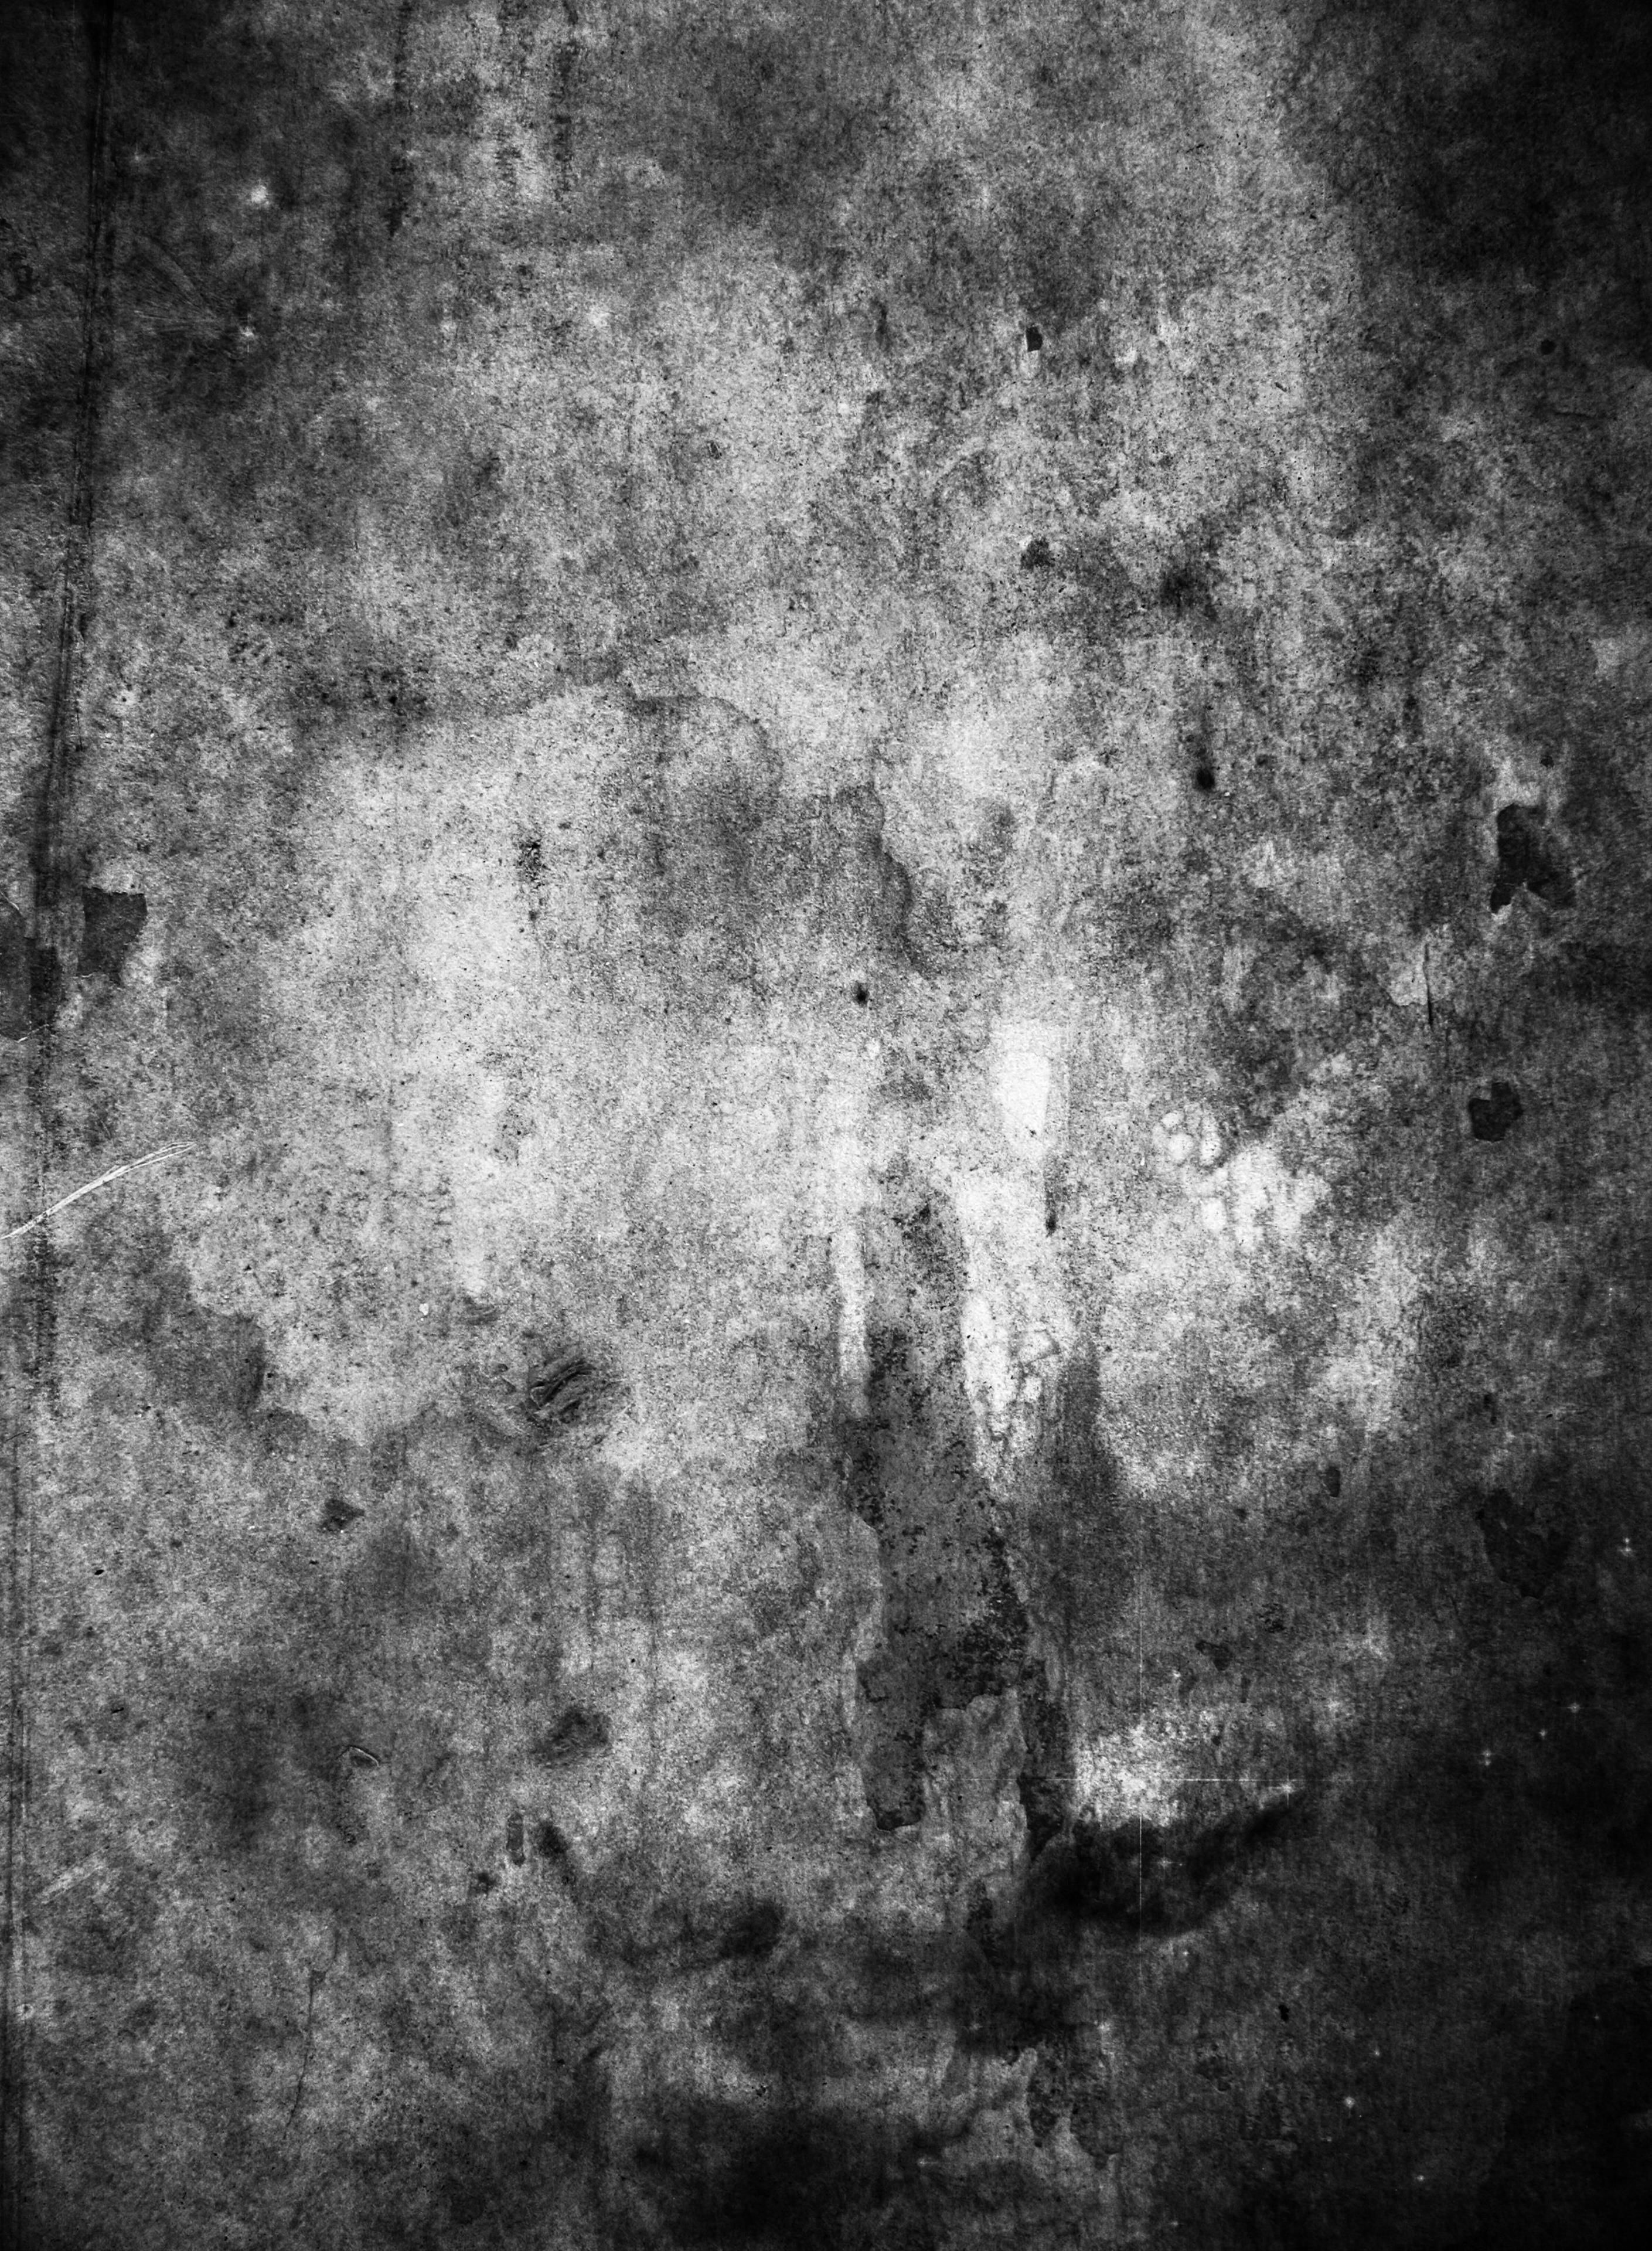 Texture 4k Wallpaper 180 Photoshop Textures Grunge Textures Dirt Texture